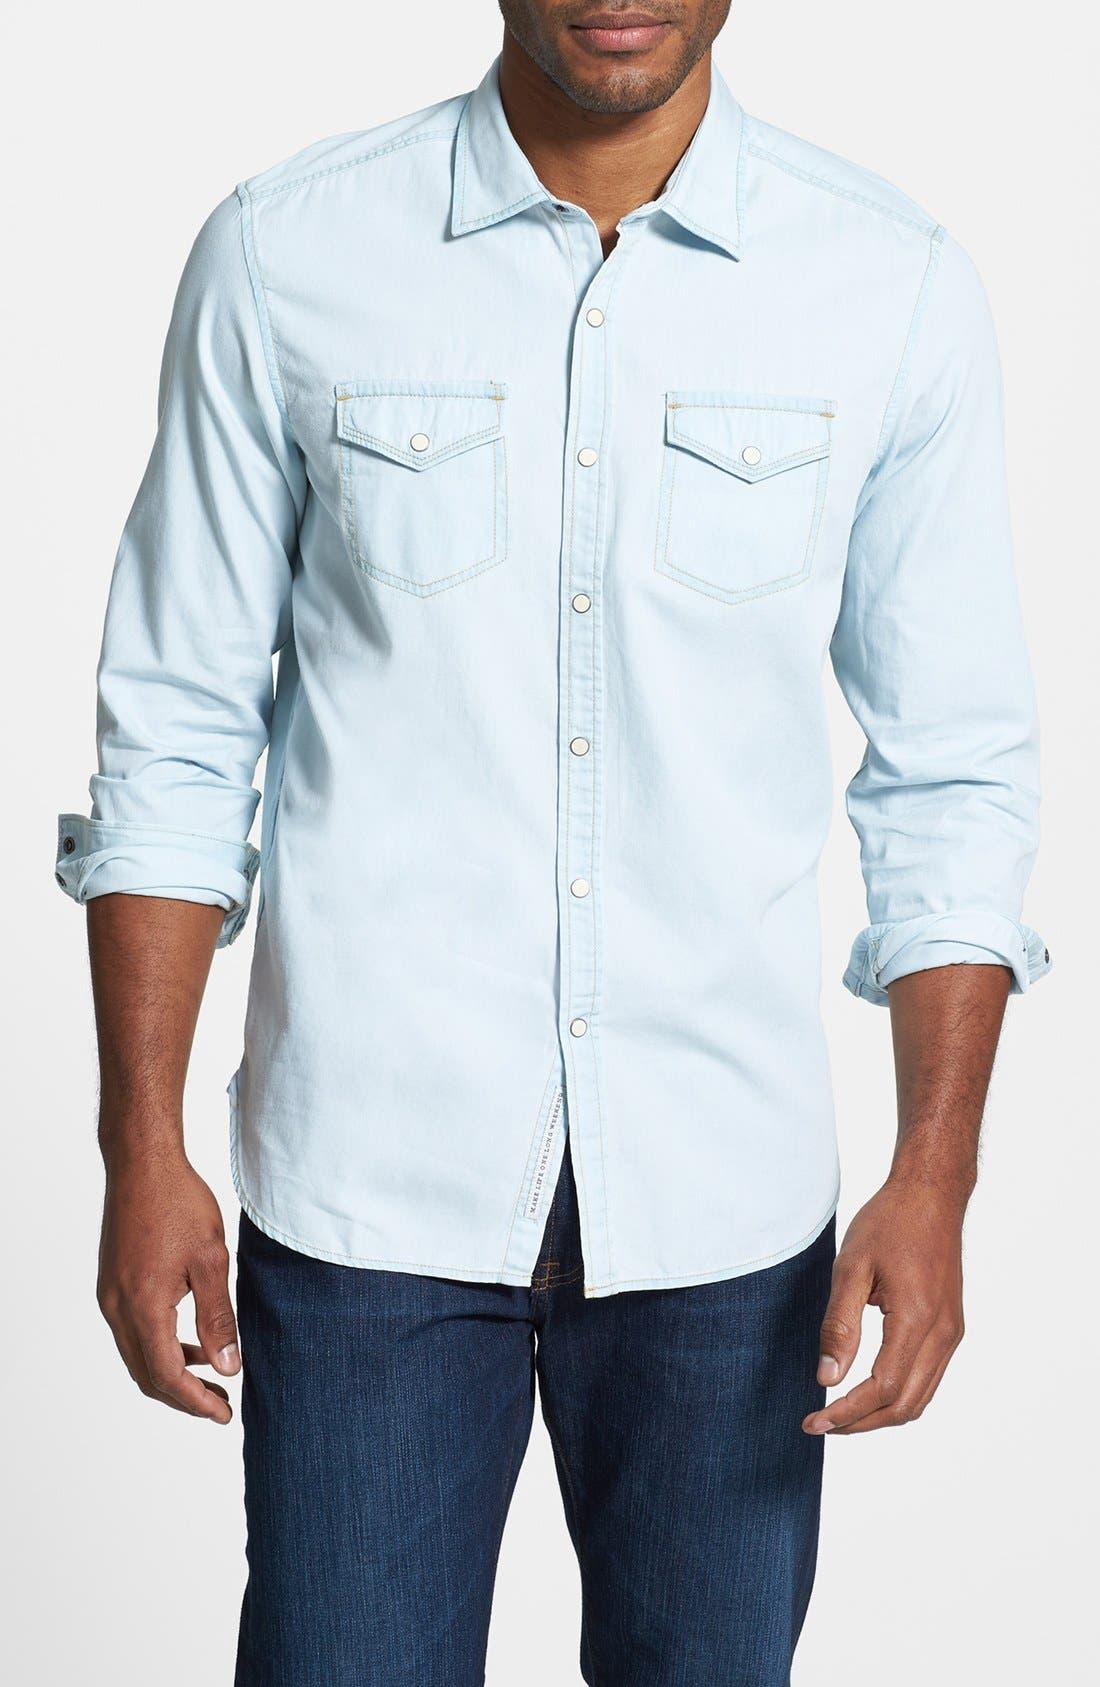 Alternate Image 1 Selected - Tommy Bahama Denim 'By All Seams' Island Modern Fit Denim Sport Shirt